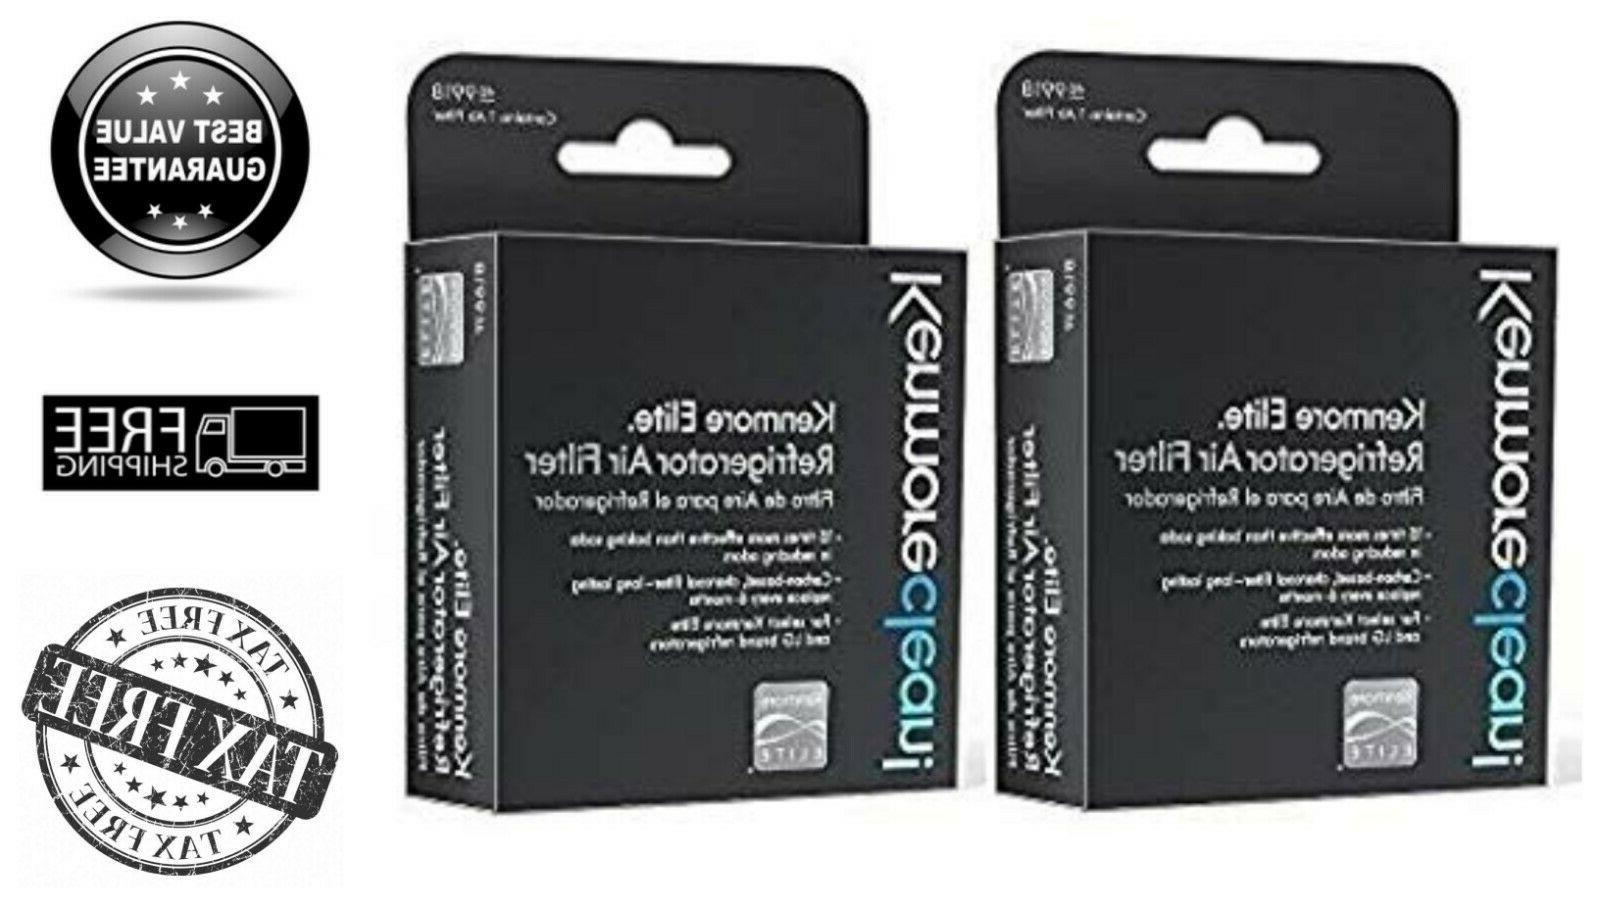 2 Pack Kenmore Elite Refrigerator Air Filter Carbon-Based Lo